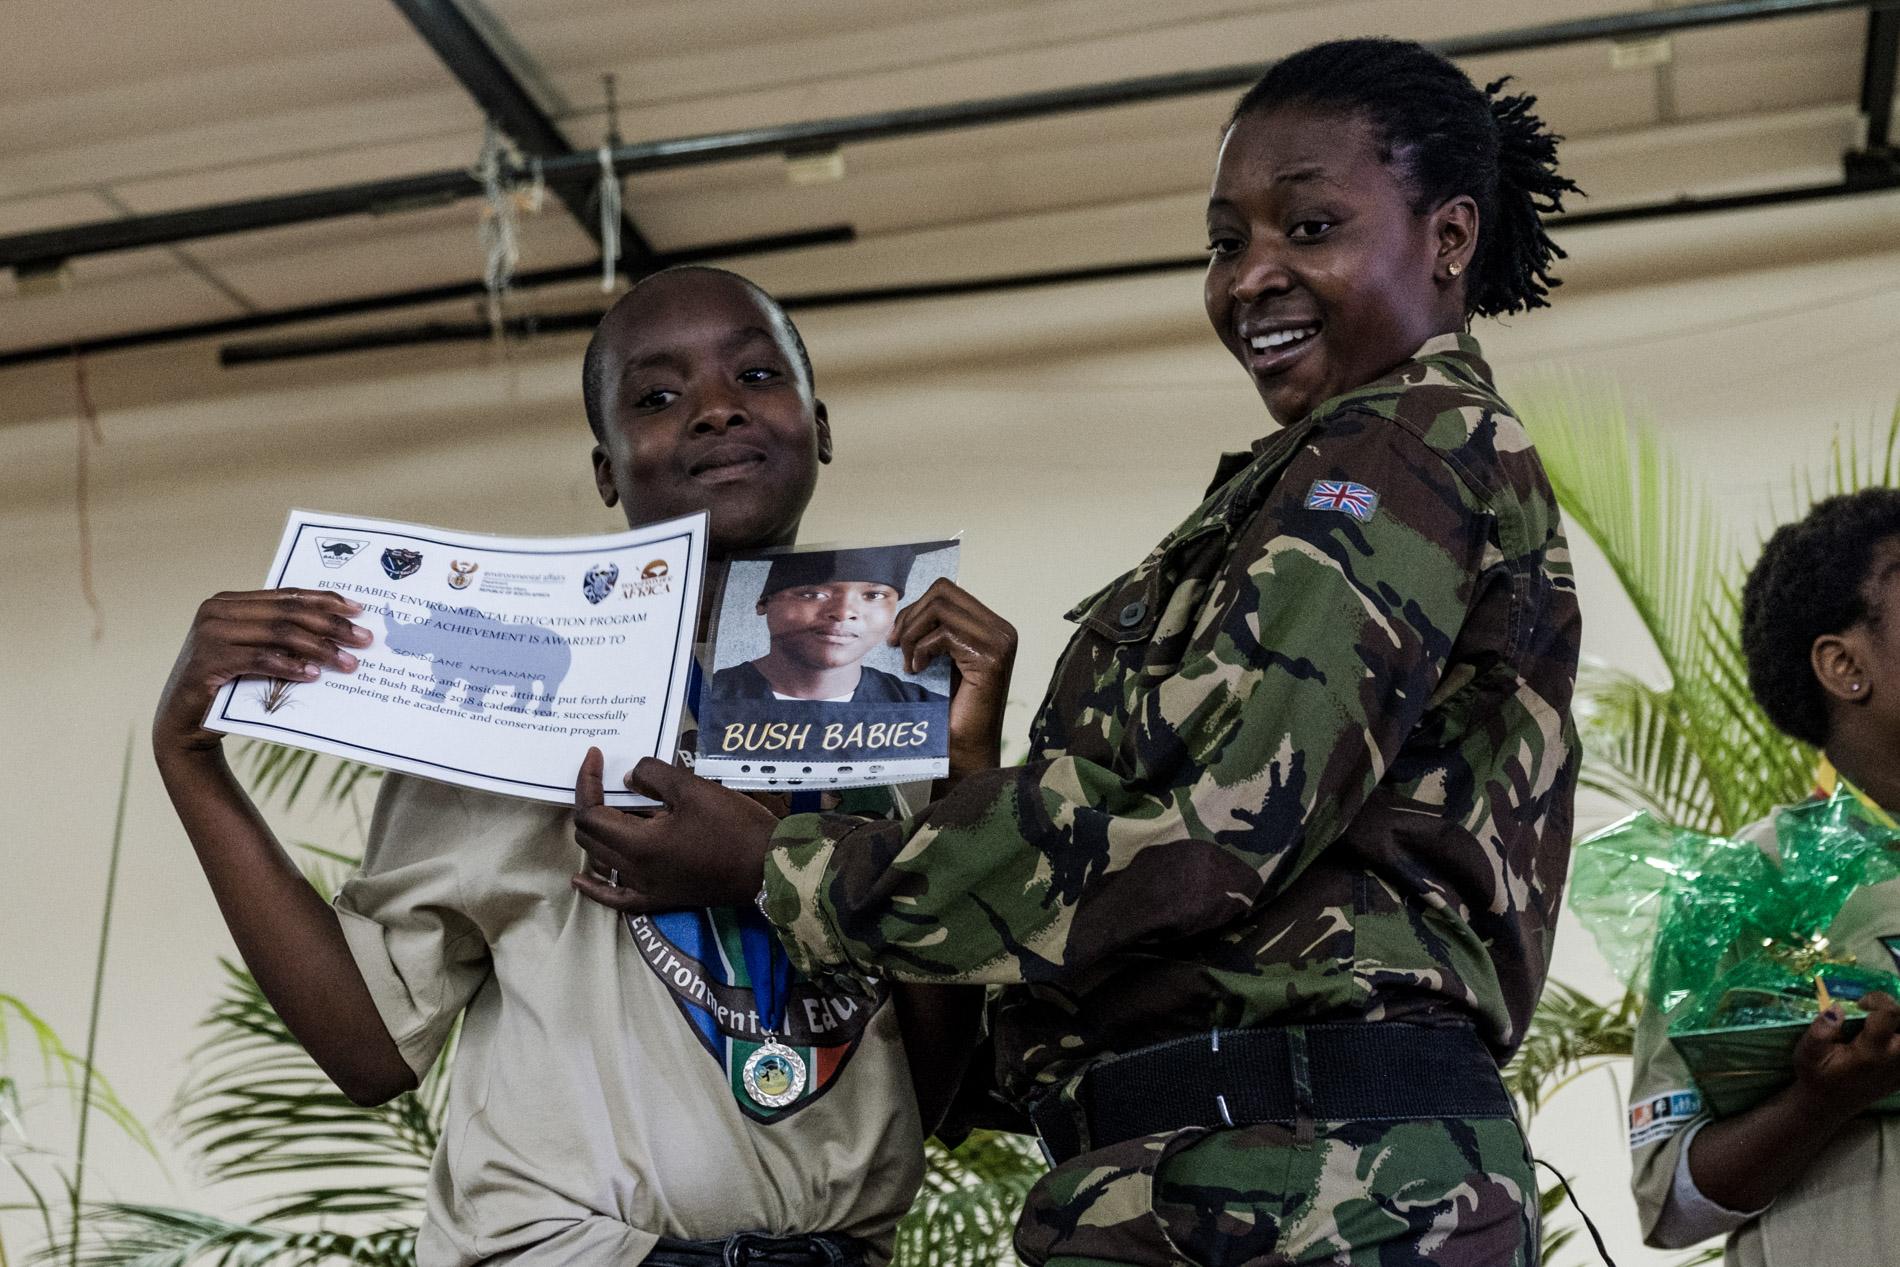 2018 - Les Black Mambas : une unite anti braconnage 100% feminine